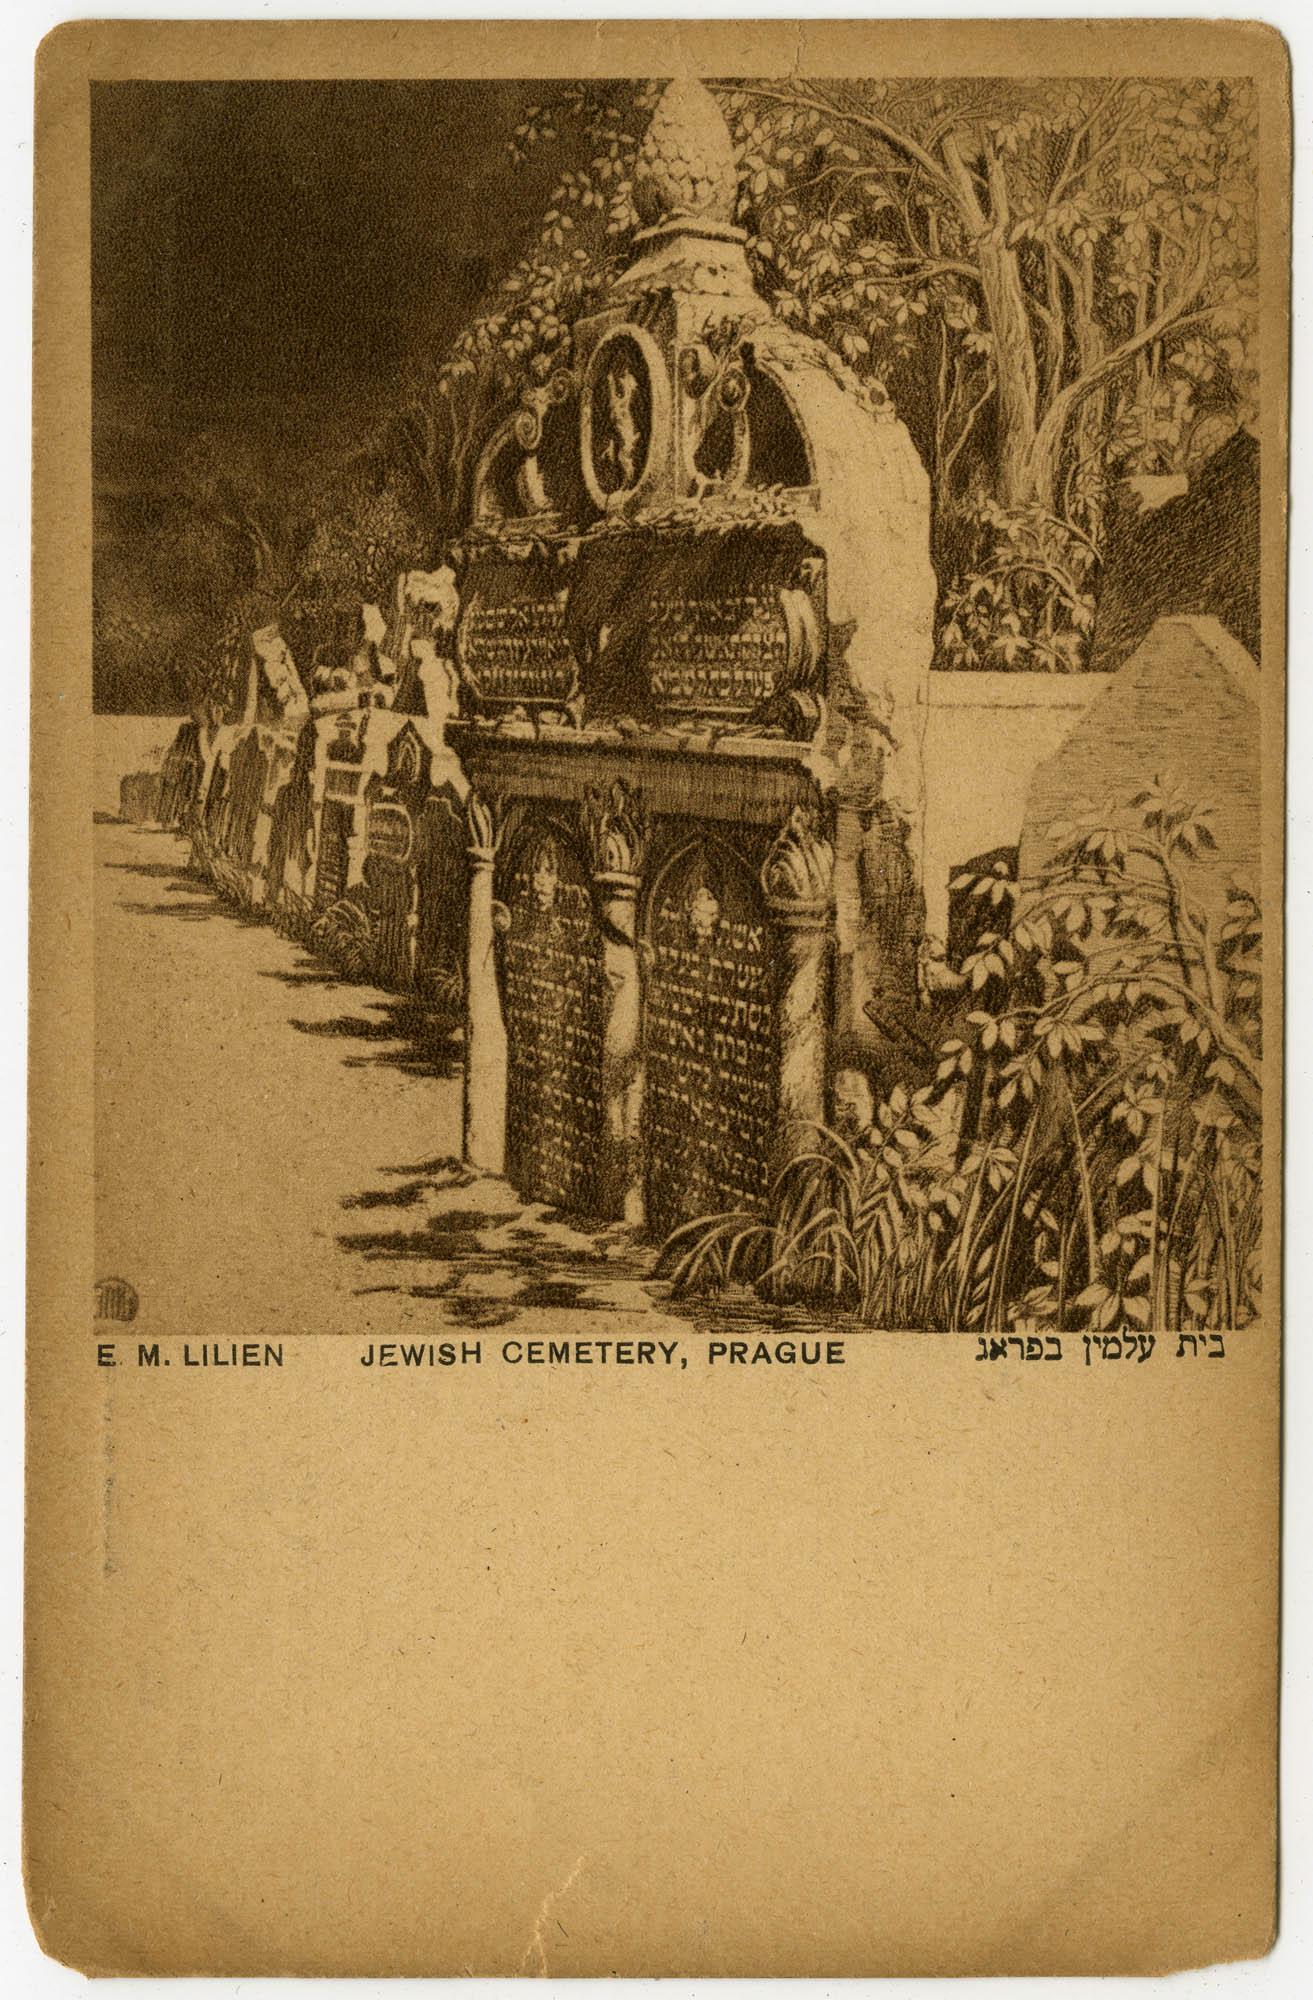 Jewish Cemetery, Prague / בית עלמין בפראג